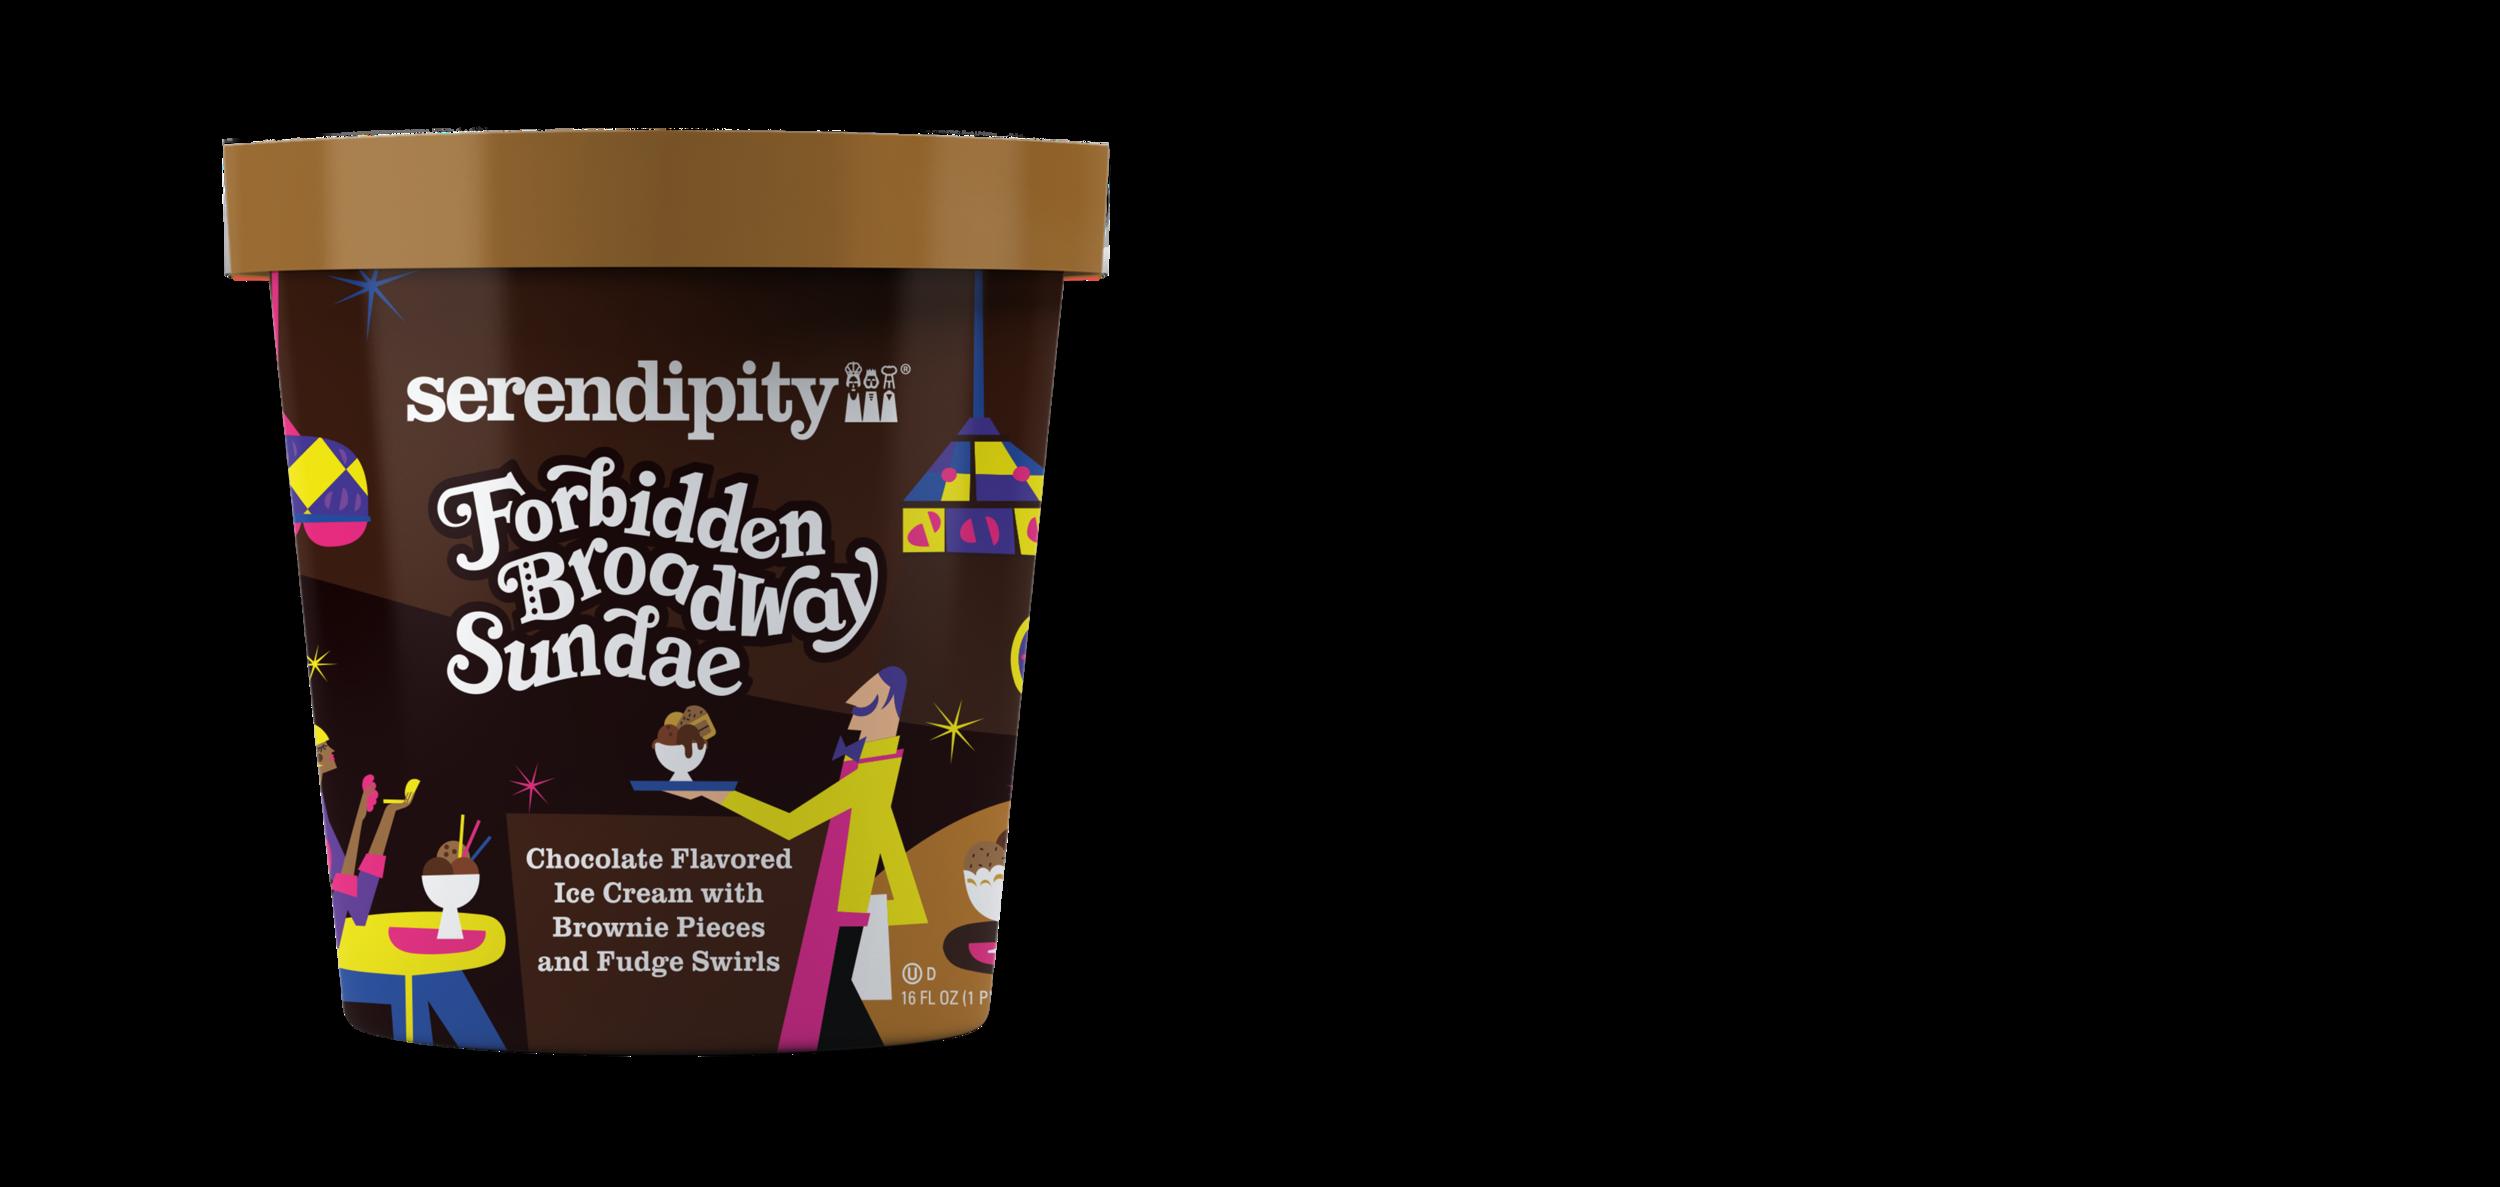 Forbidden Broadway Sundae - Chocolate Flavored Ice Cream with Brownie Pieces and Fudge Swirls